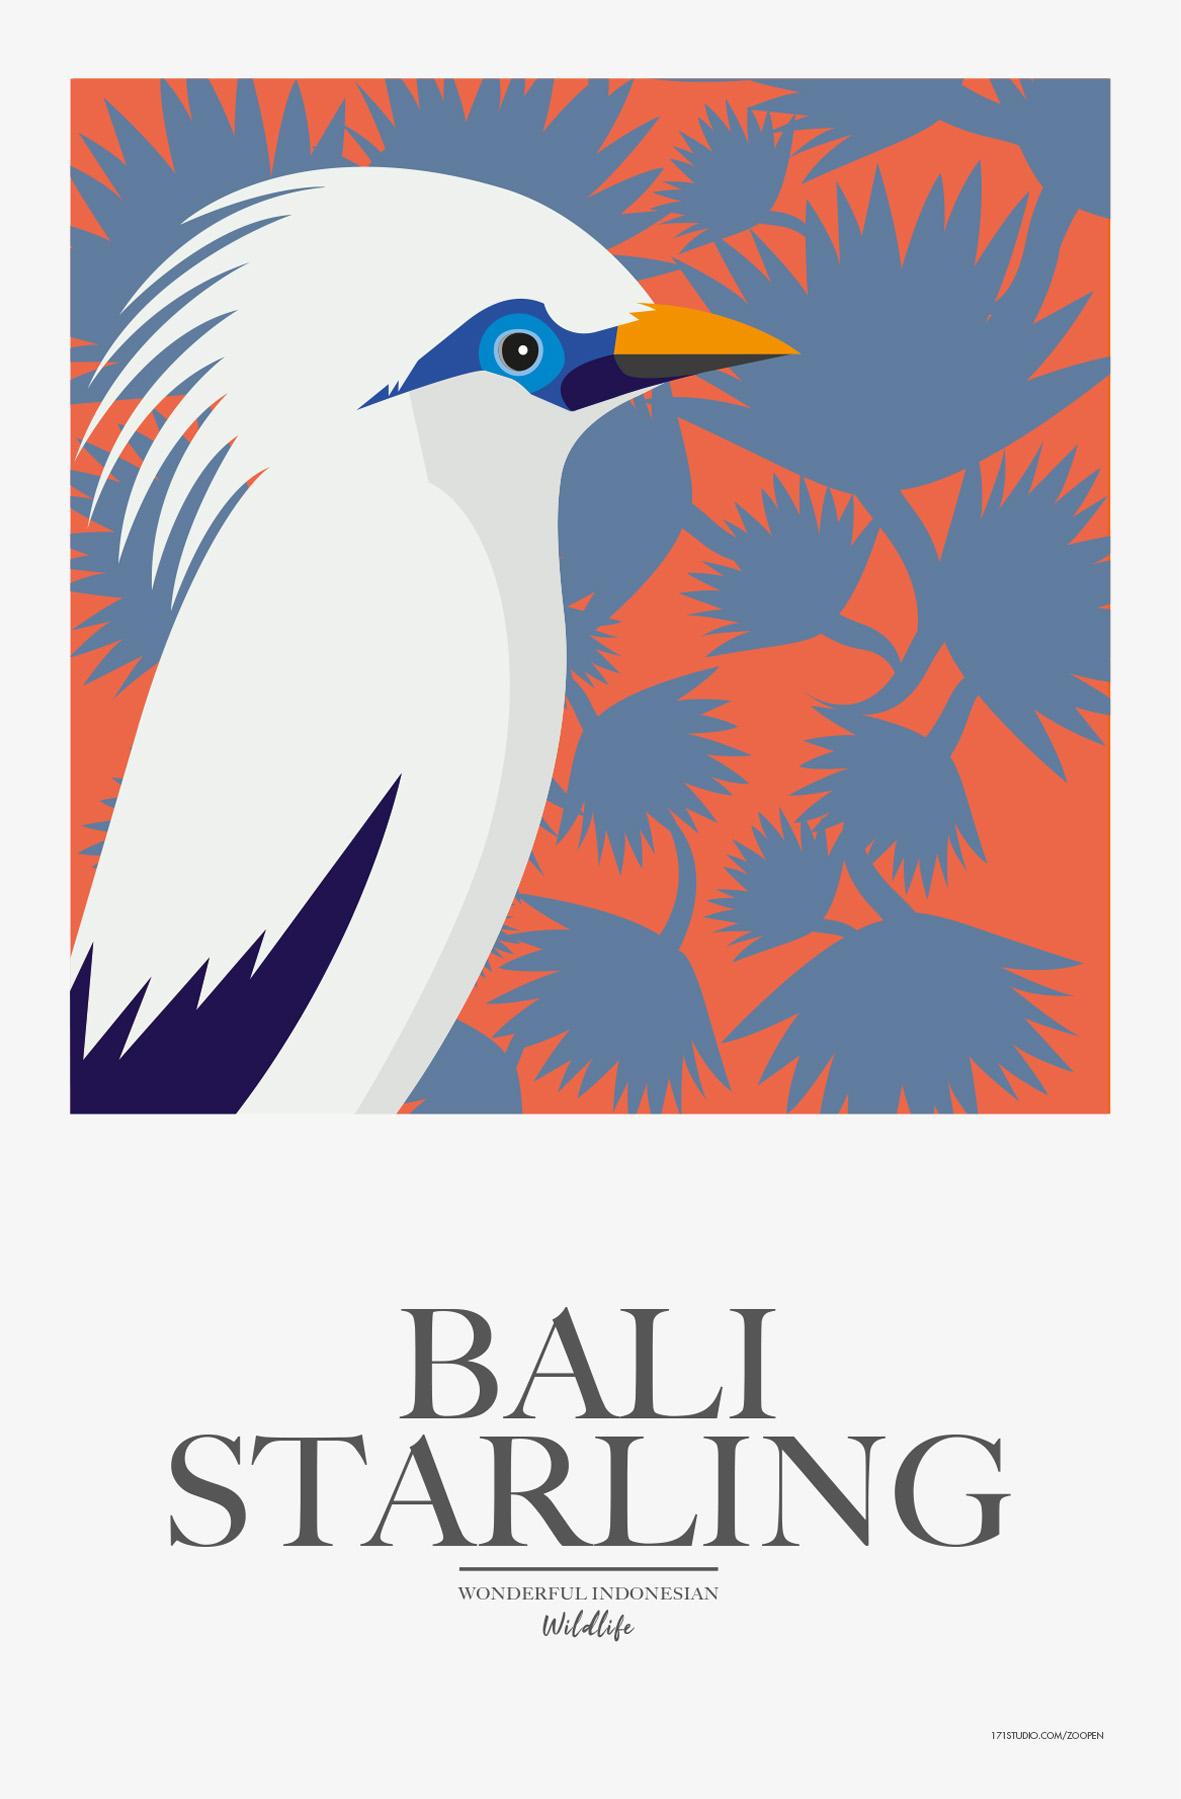 BaliStarling171studiomathieusechet